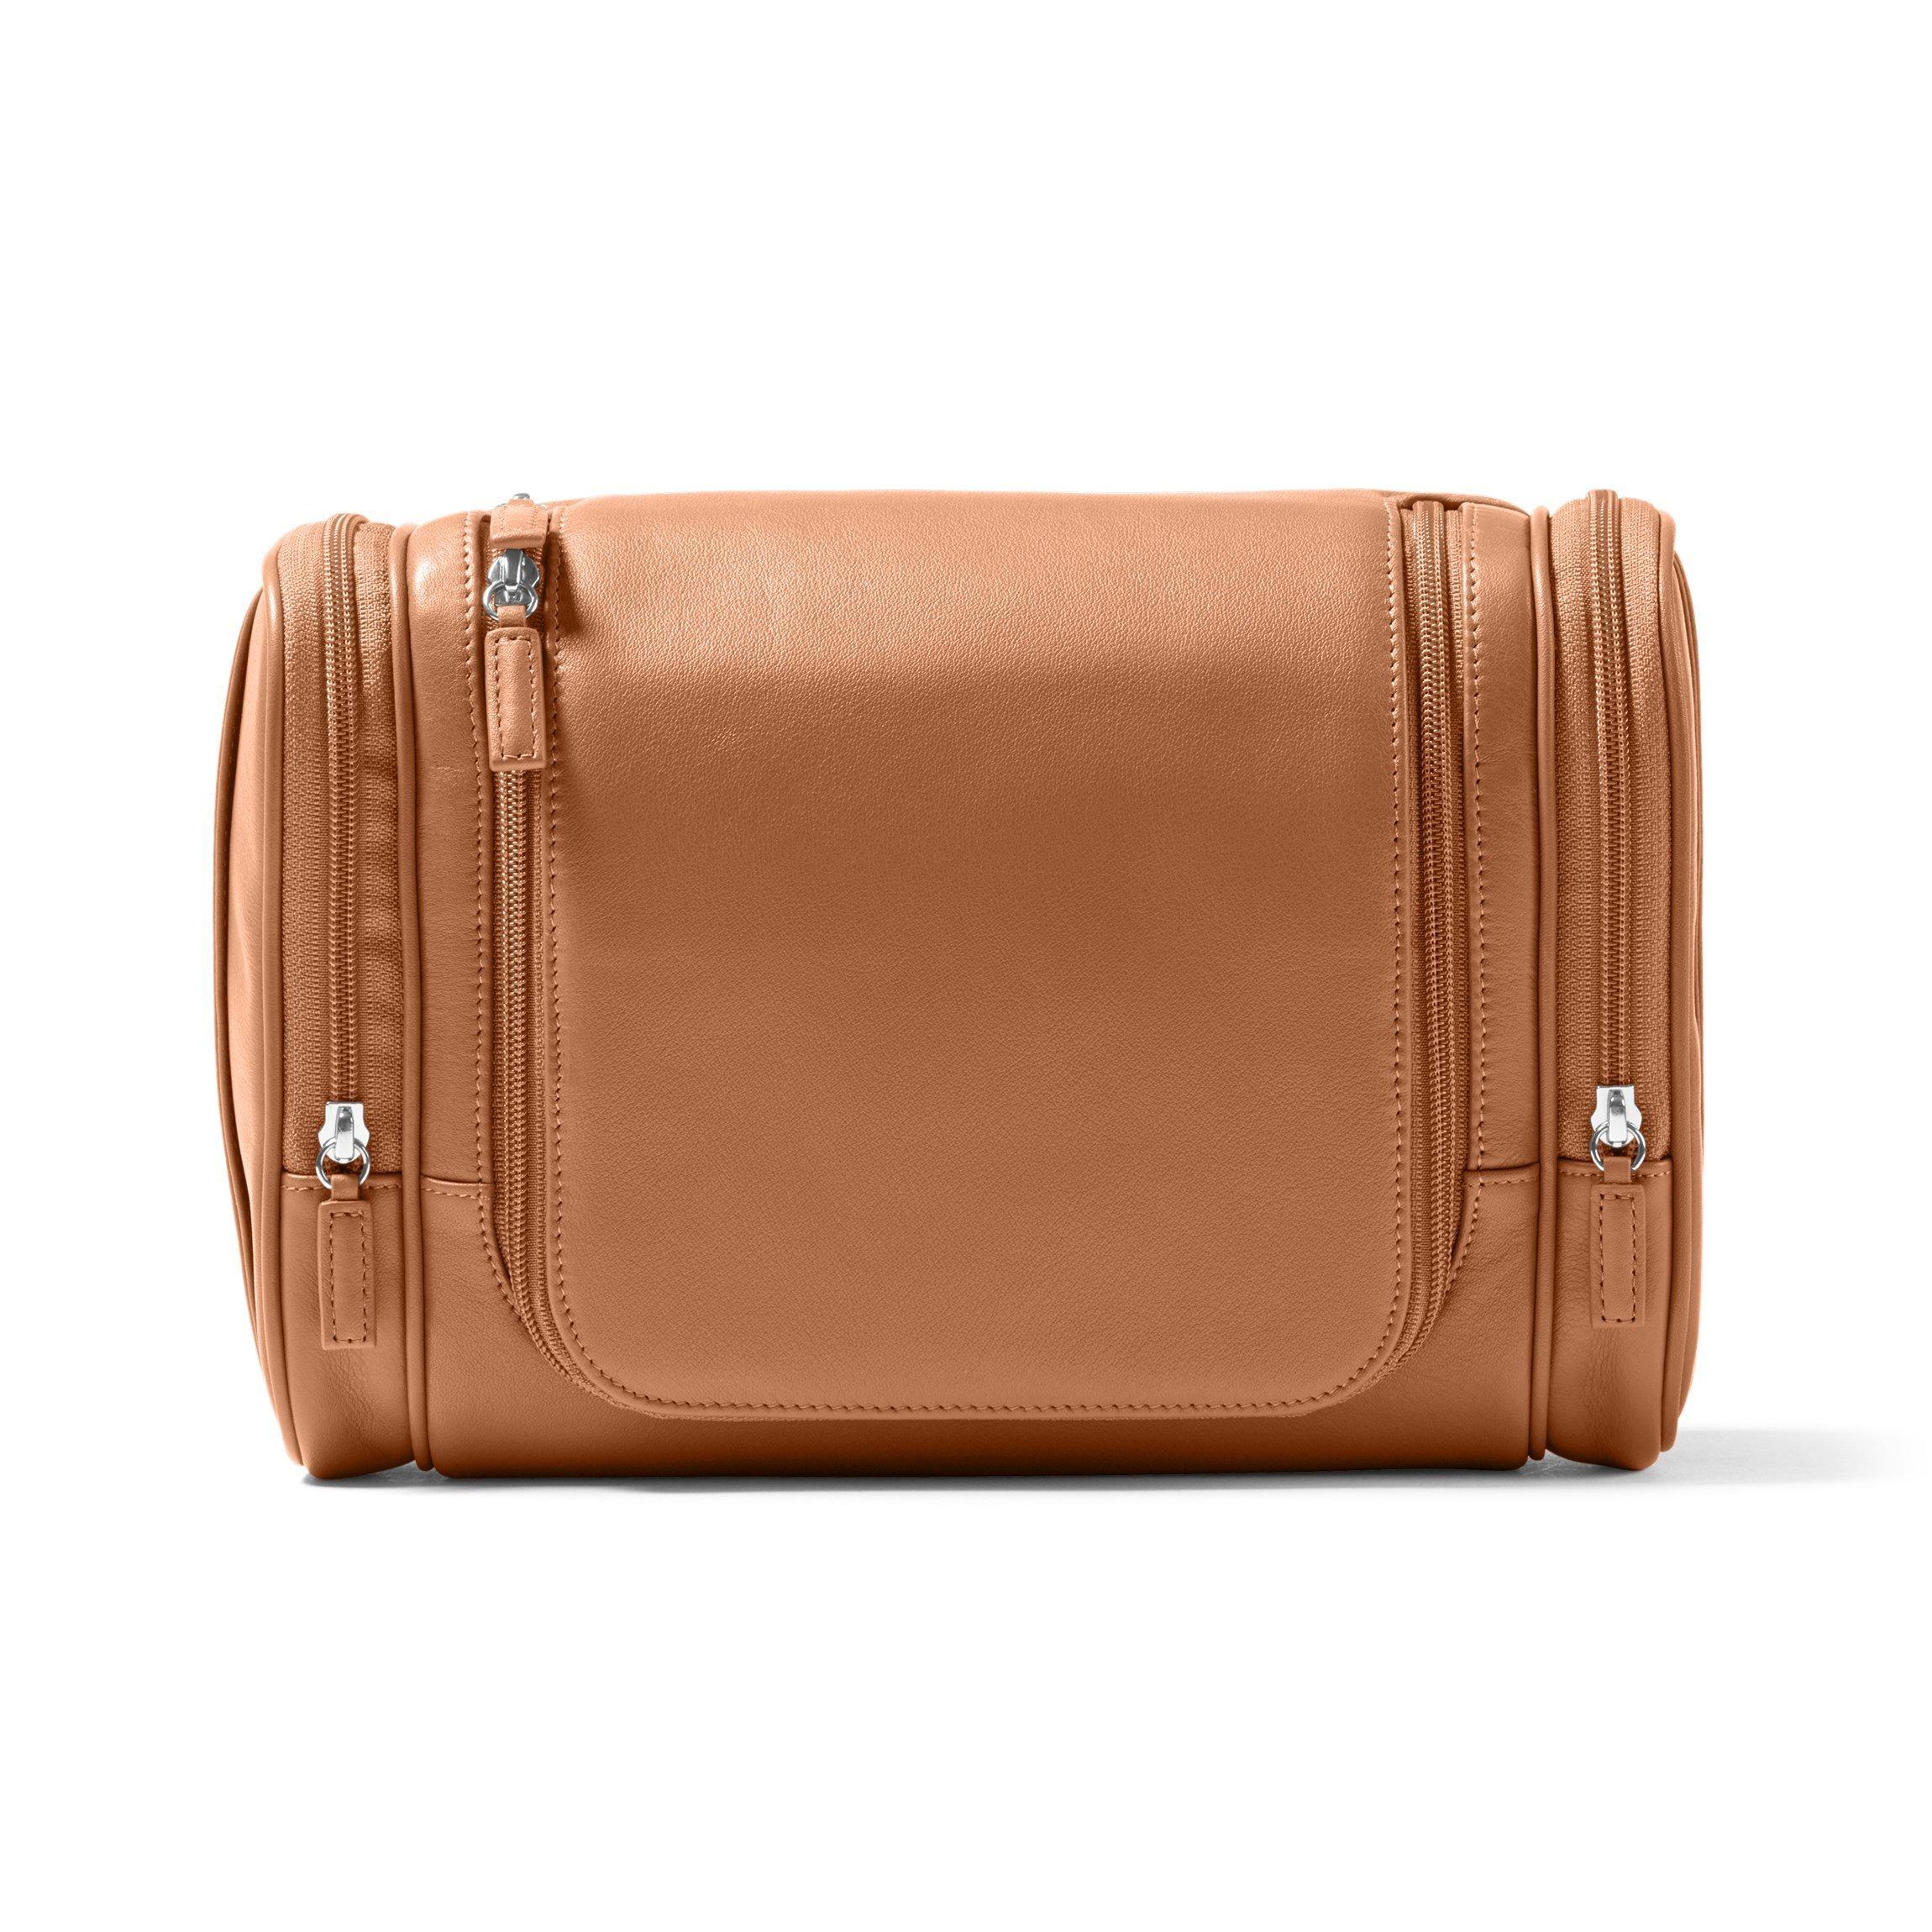 Leatherology Multi Pocket Hanging Toiletry - Full Grain Leather - Cognac (brown)